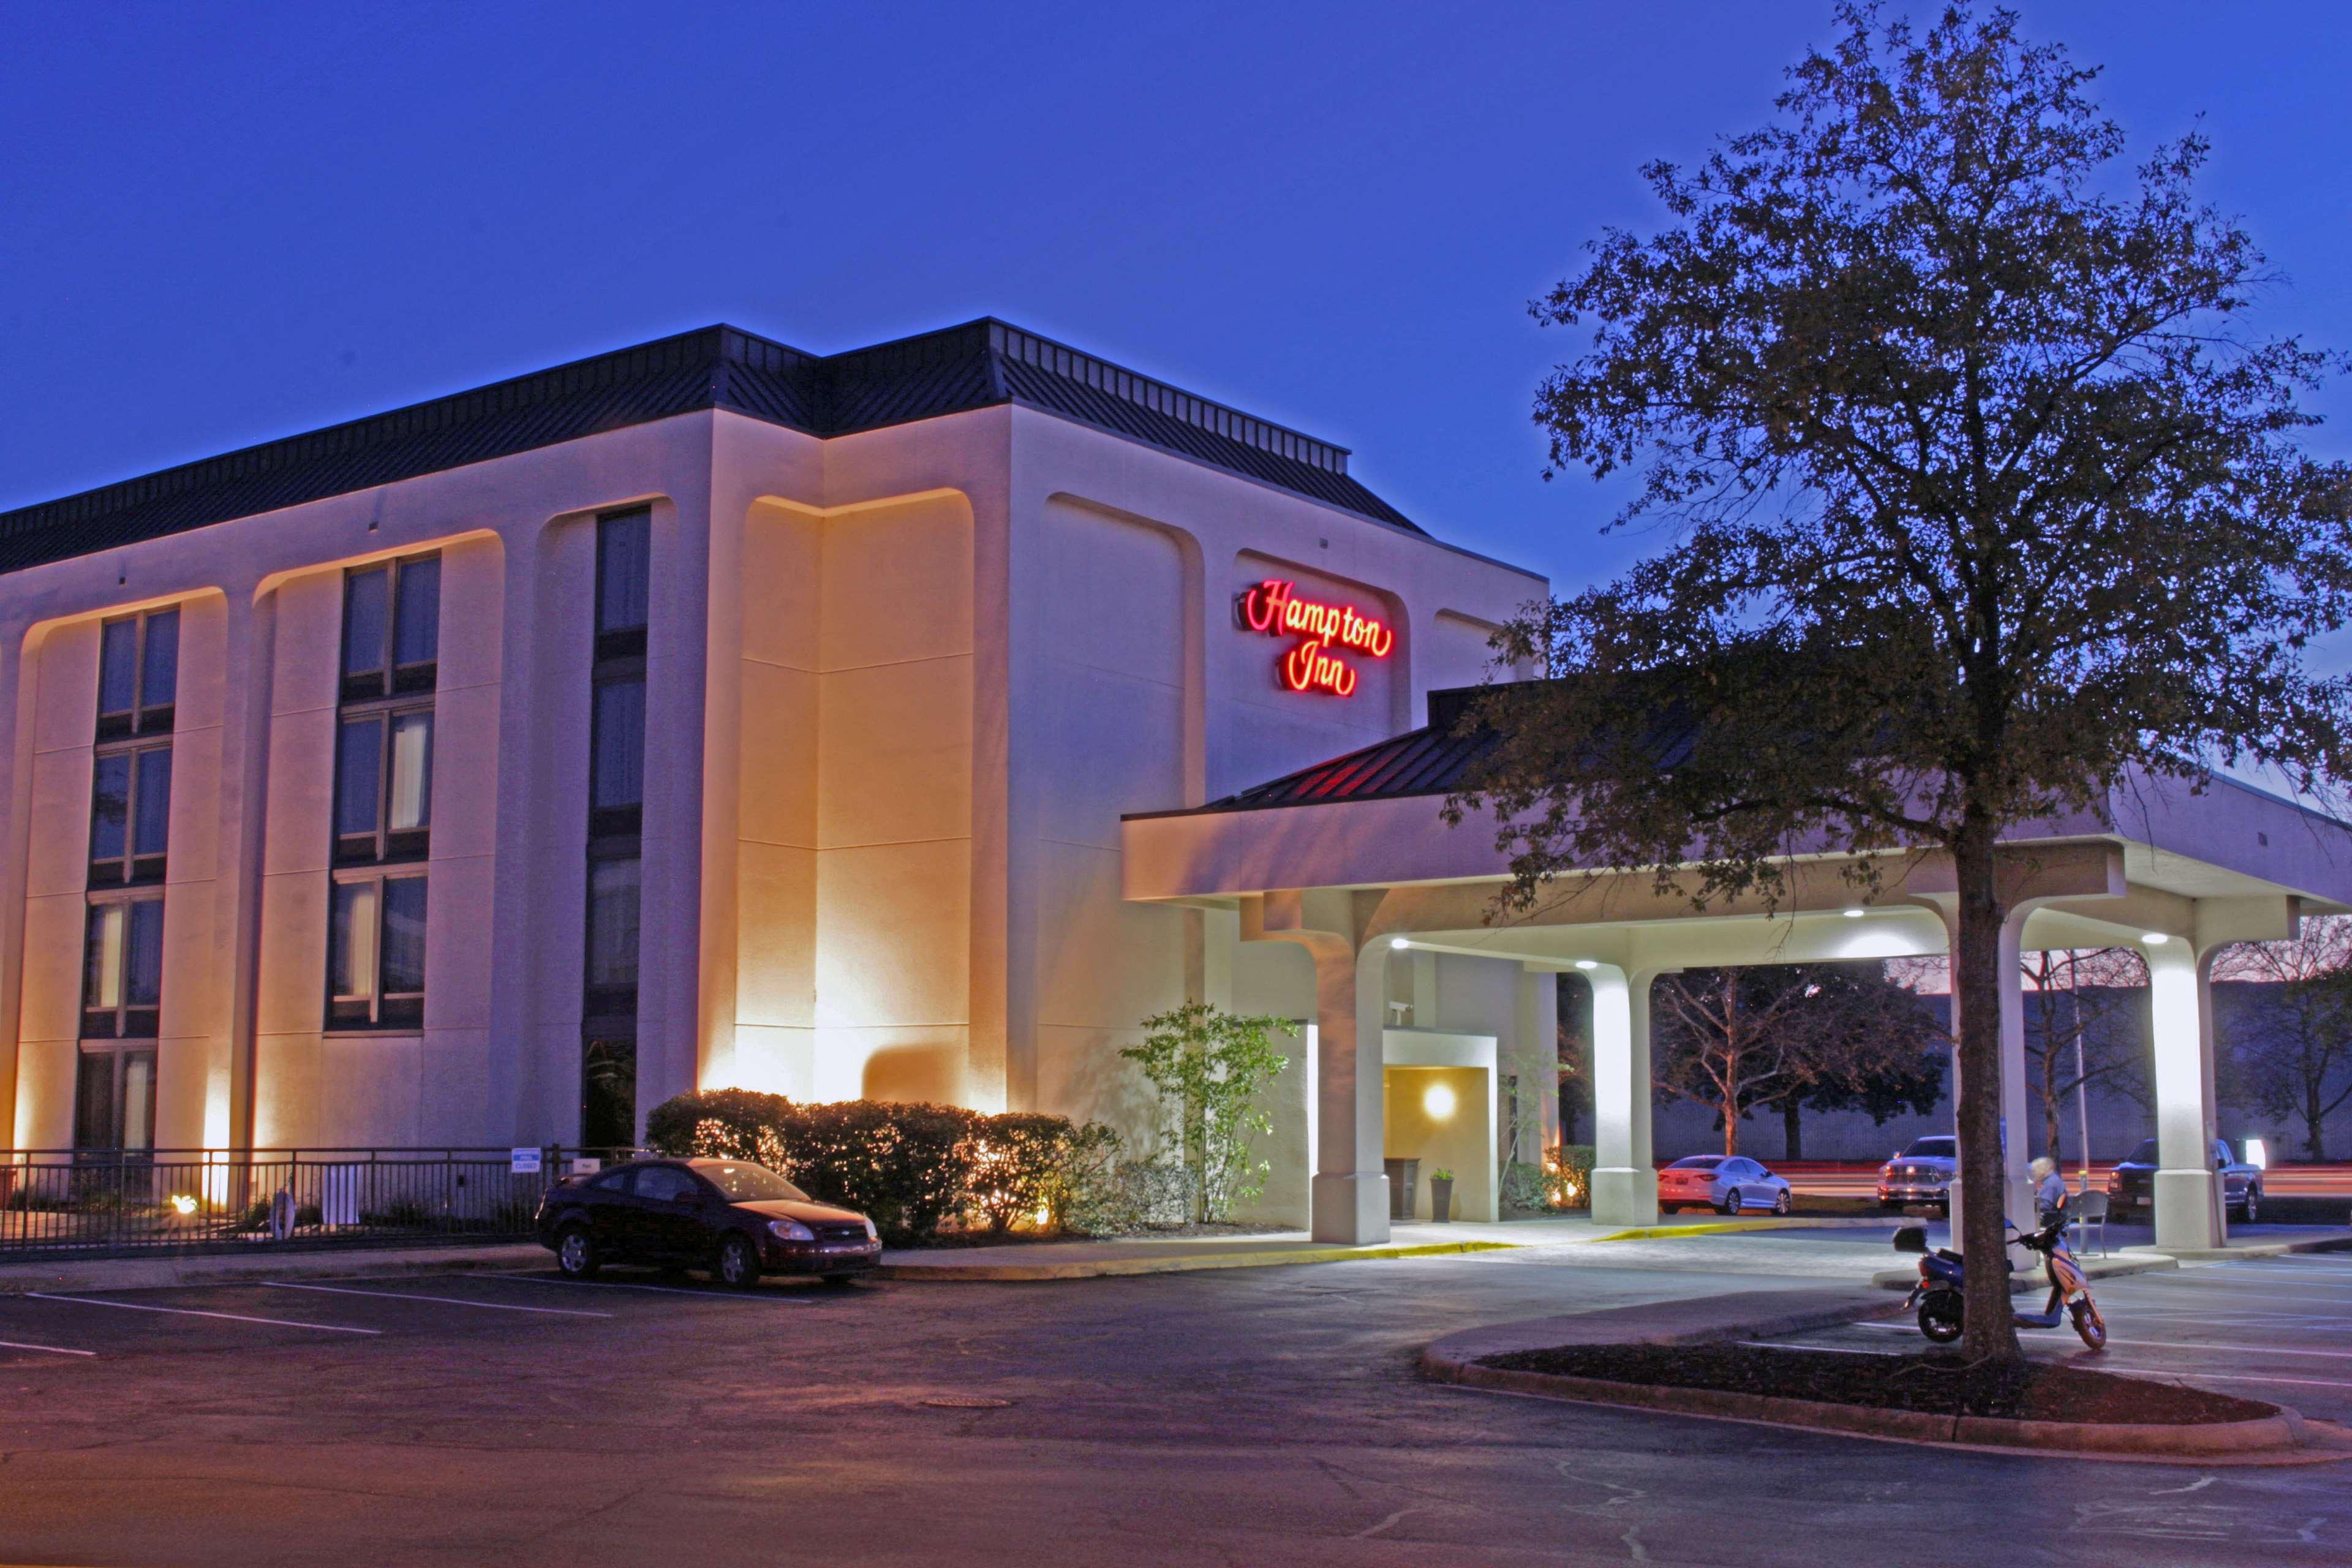 Hampton Inn Norfolk/Chesapeake (Greenbrier Area) - Chesapeake, VA 23320 - (757)420-1550 | ShowMeLocal.com